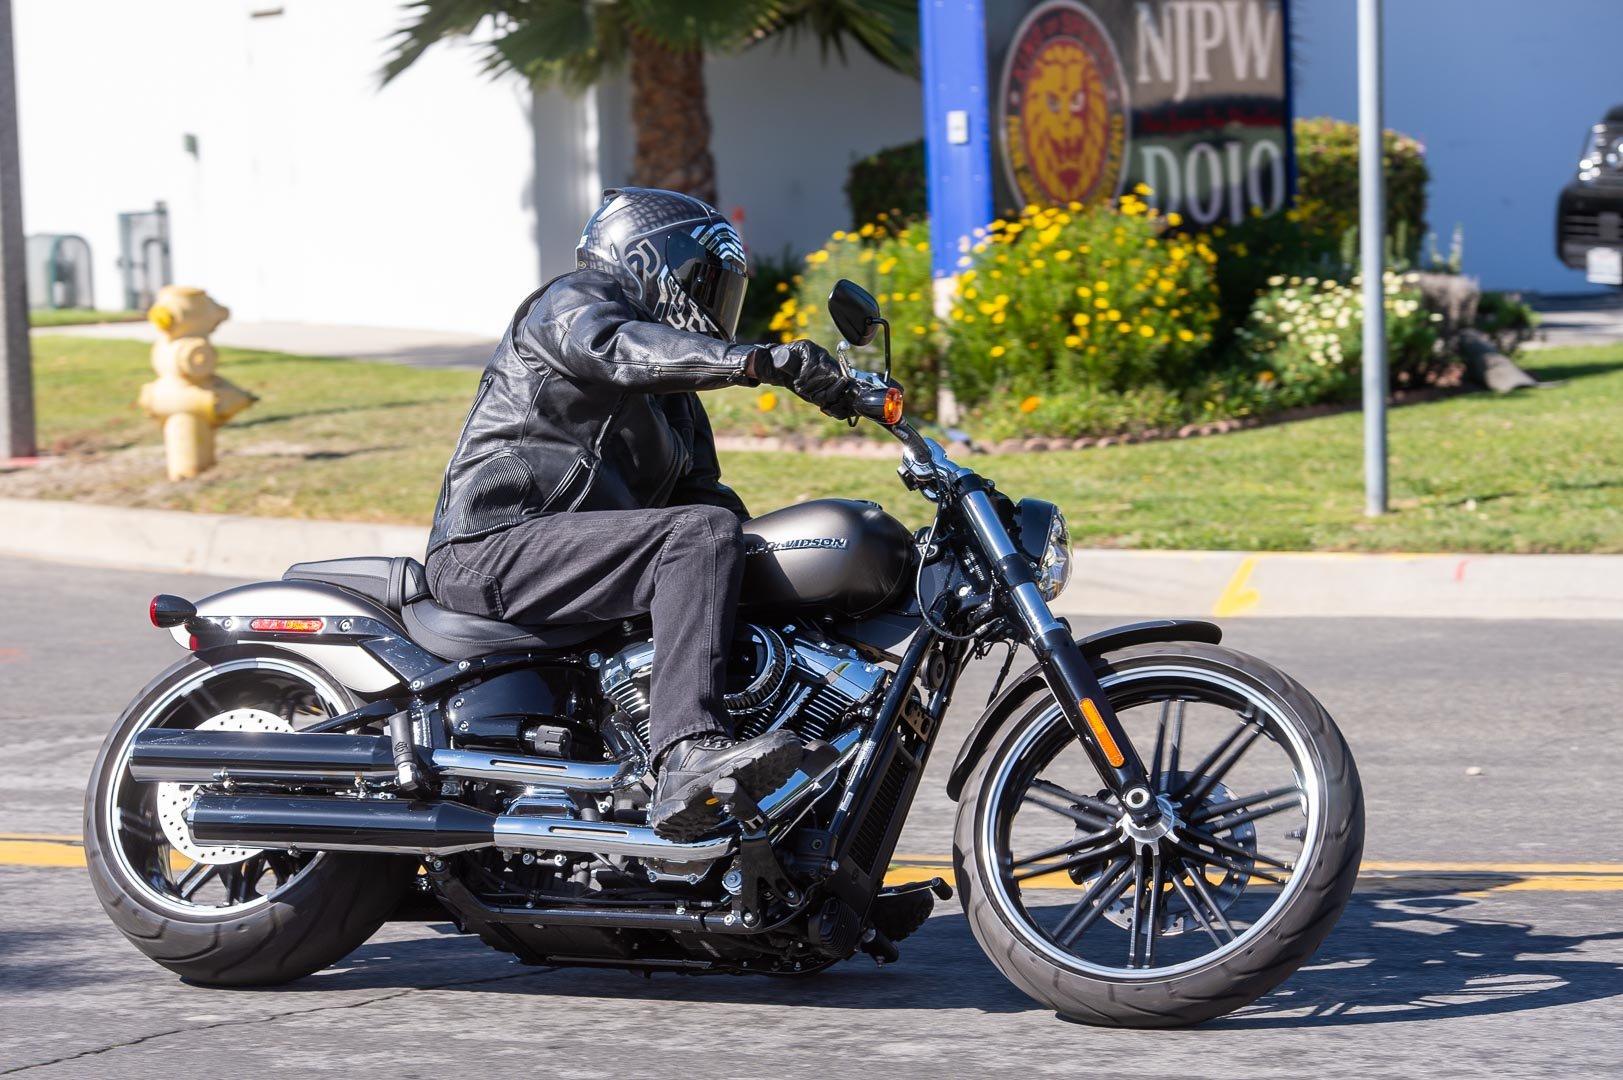 2020 Harley-Davidson Breakout Review: Badass Motorcycle